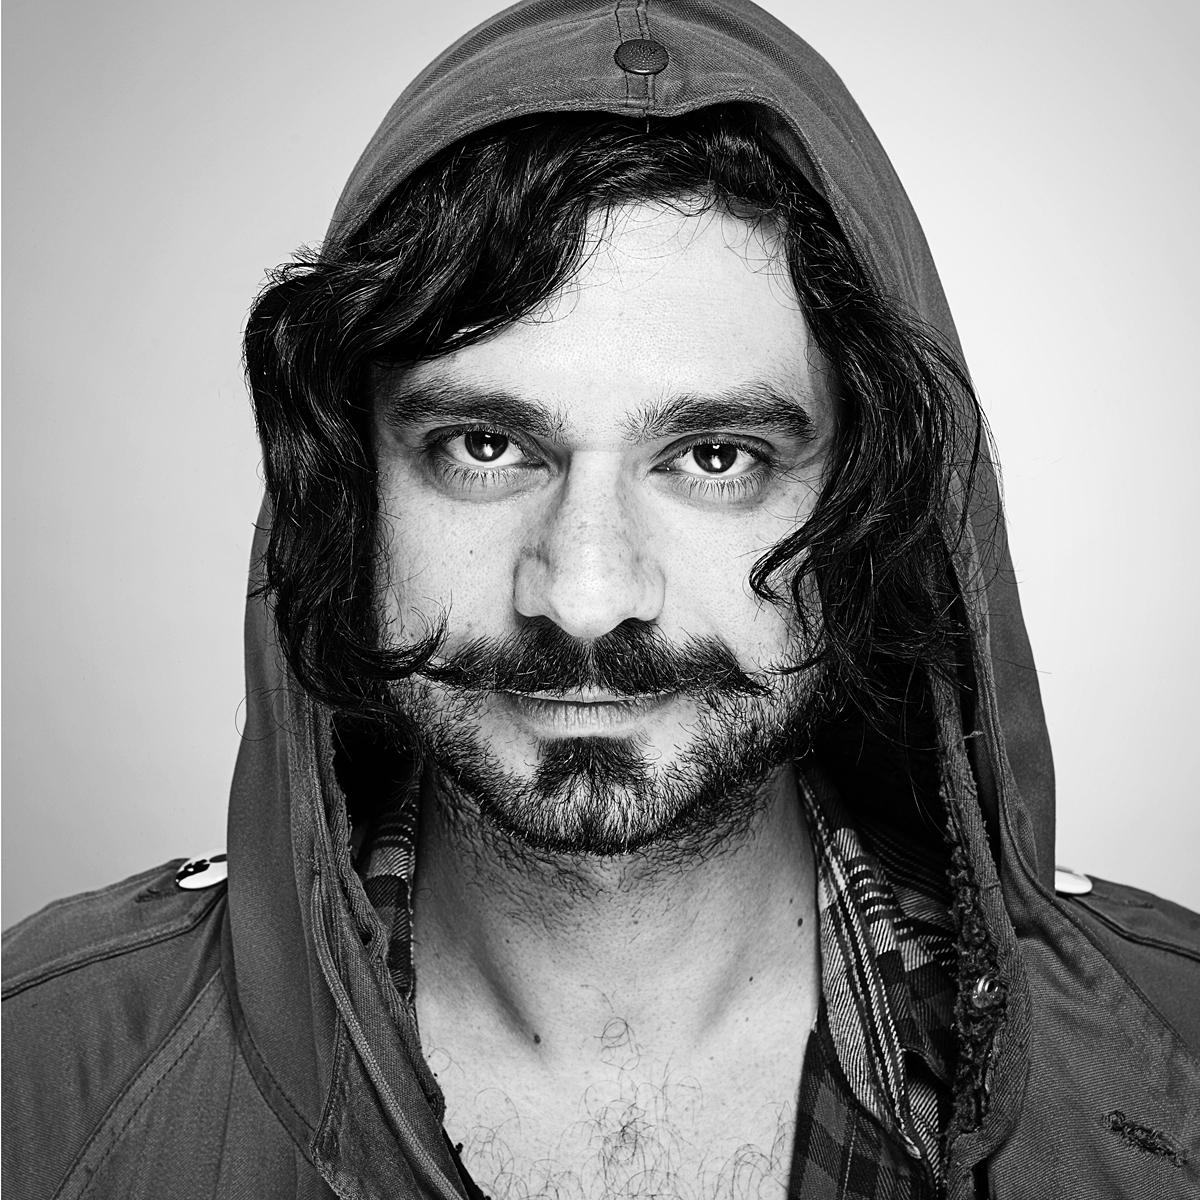 Portrait of Dan Fatel of Elephant Music by creative photographer Julian Hanford